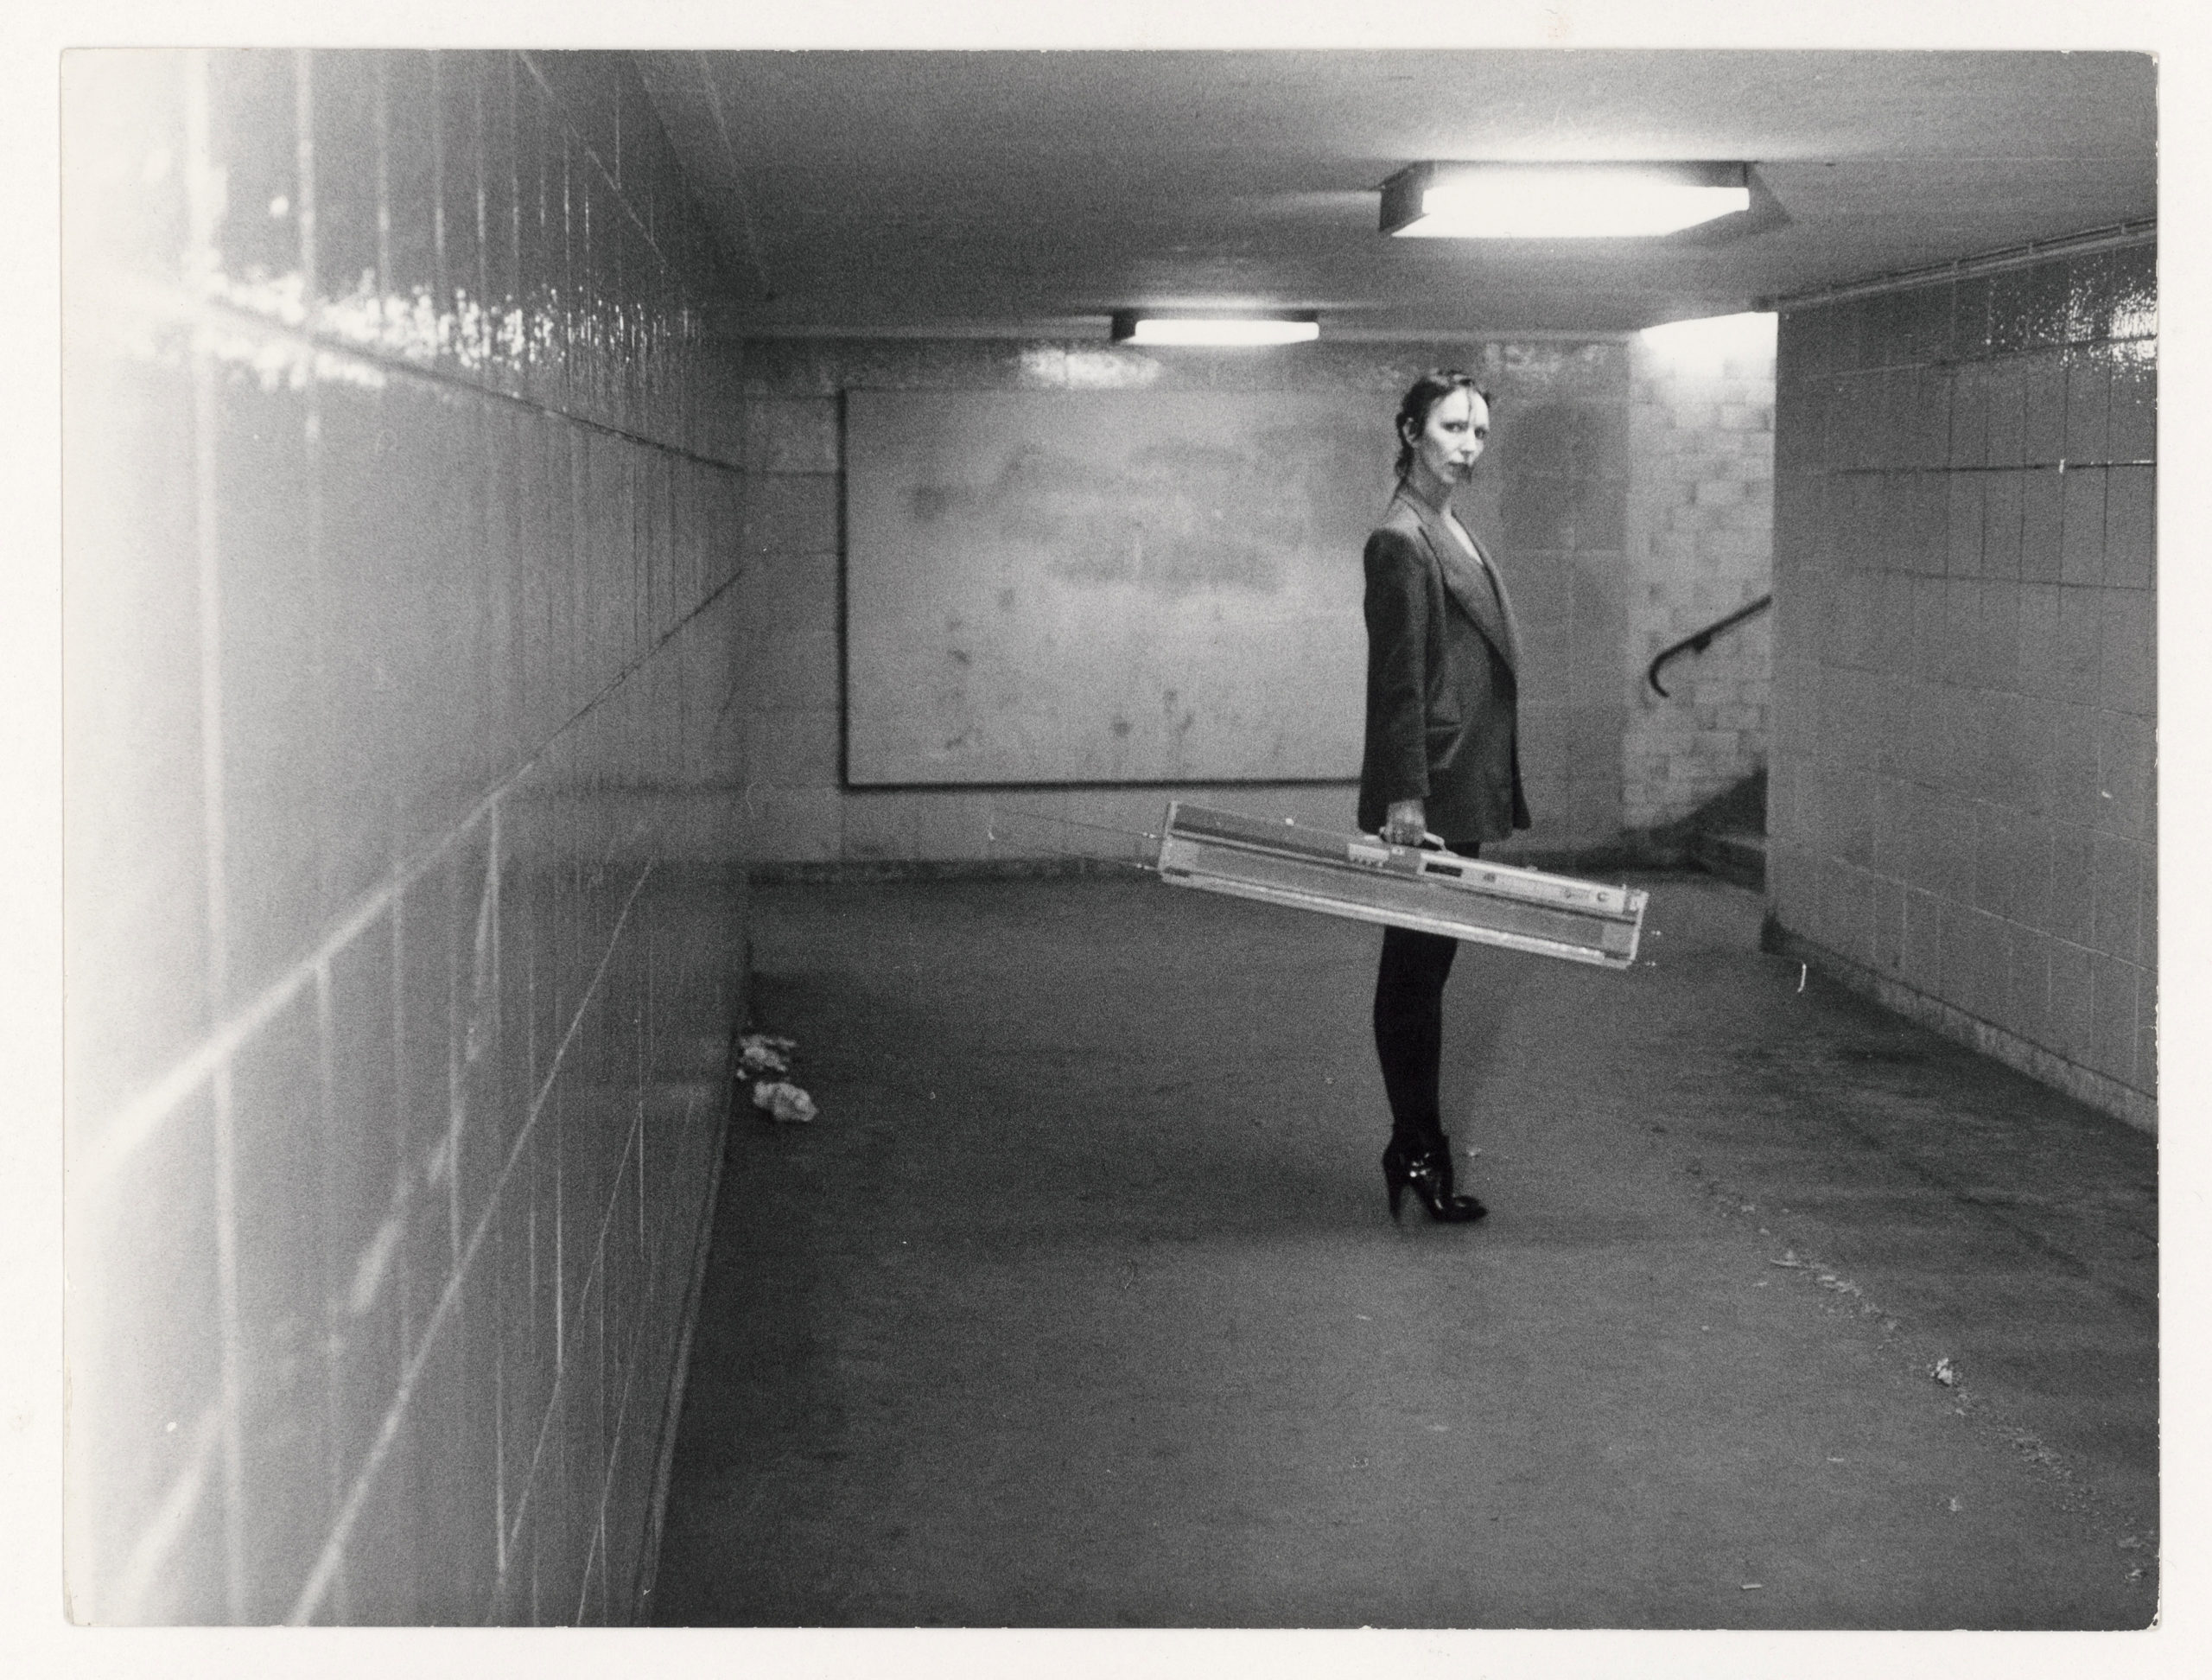 Martin Kippenberger, Ohne Titel (Claudia Skoda mit ihrer Strickmaschine im U-Bahnhof Kottbusser Tor, Berlin), ca. 1976-77. Foto: Estate of Martin Kippenberger/Galerie Gisela Capitain, Köln/SMB/Kunstbibliothek/Dietmar Katz